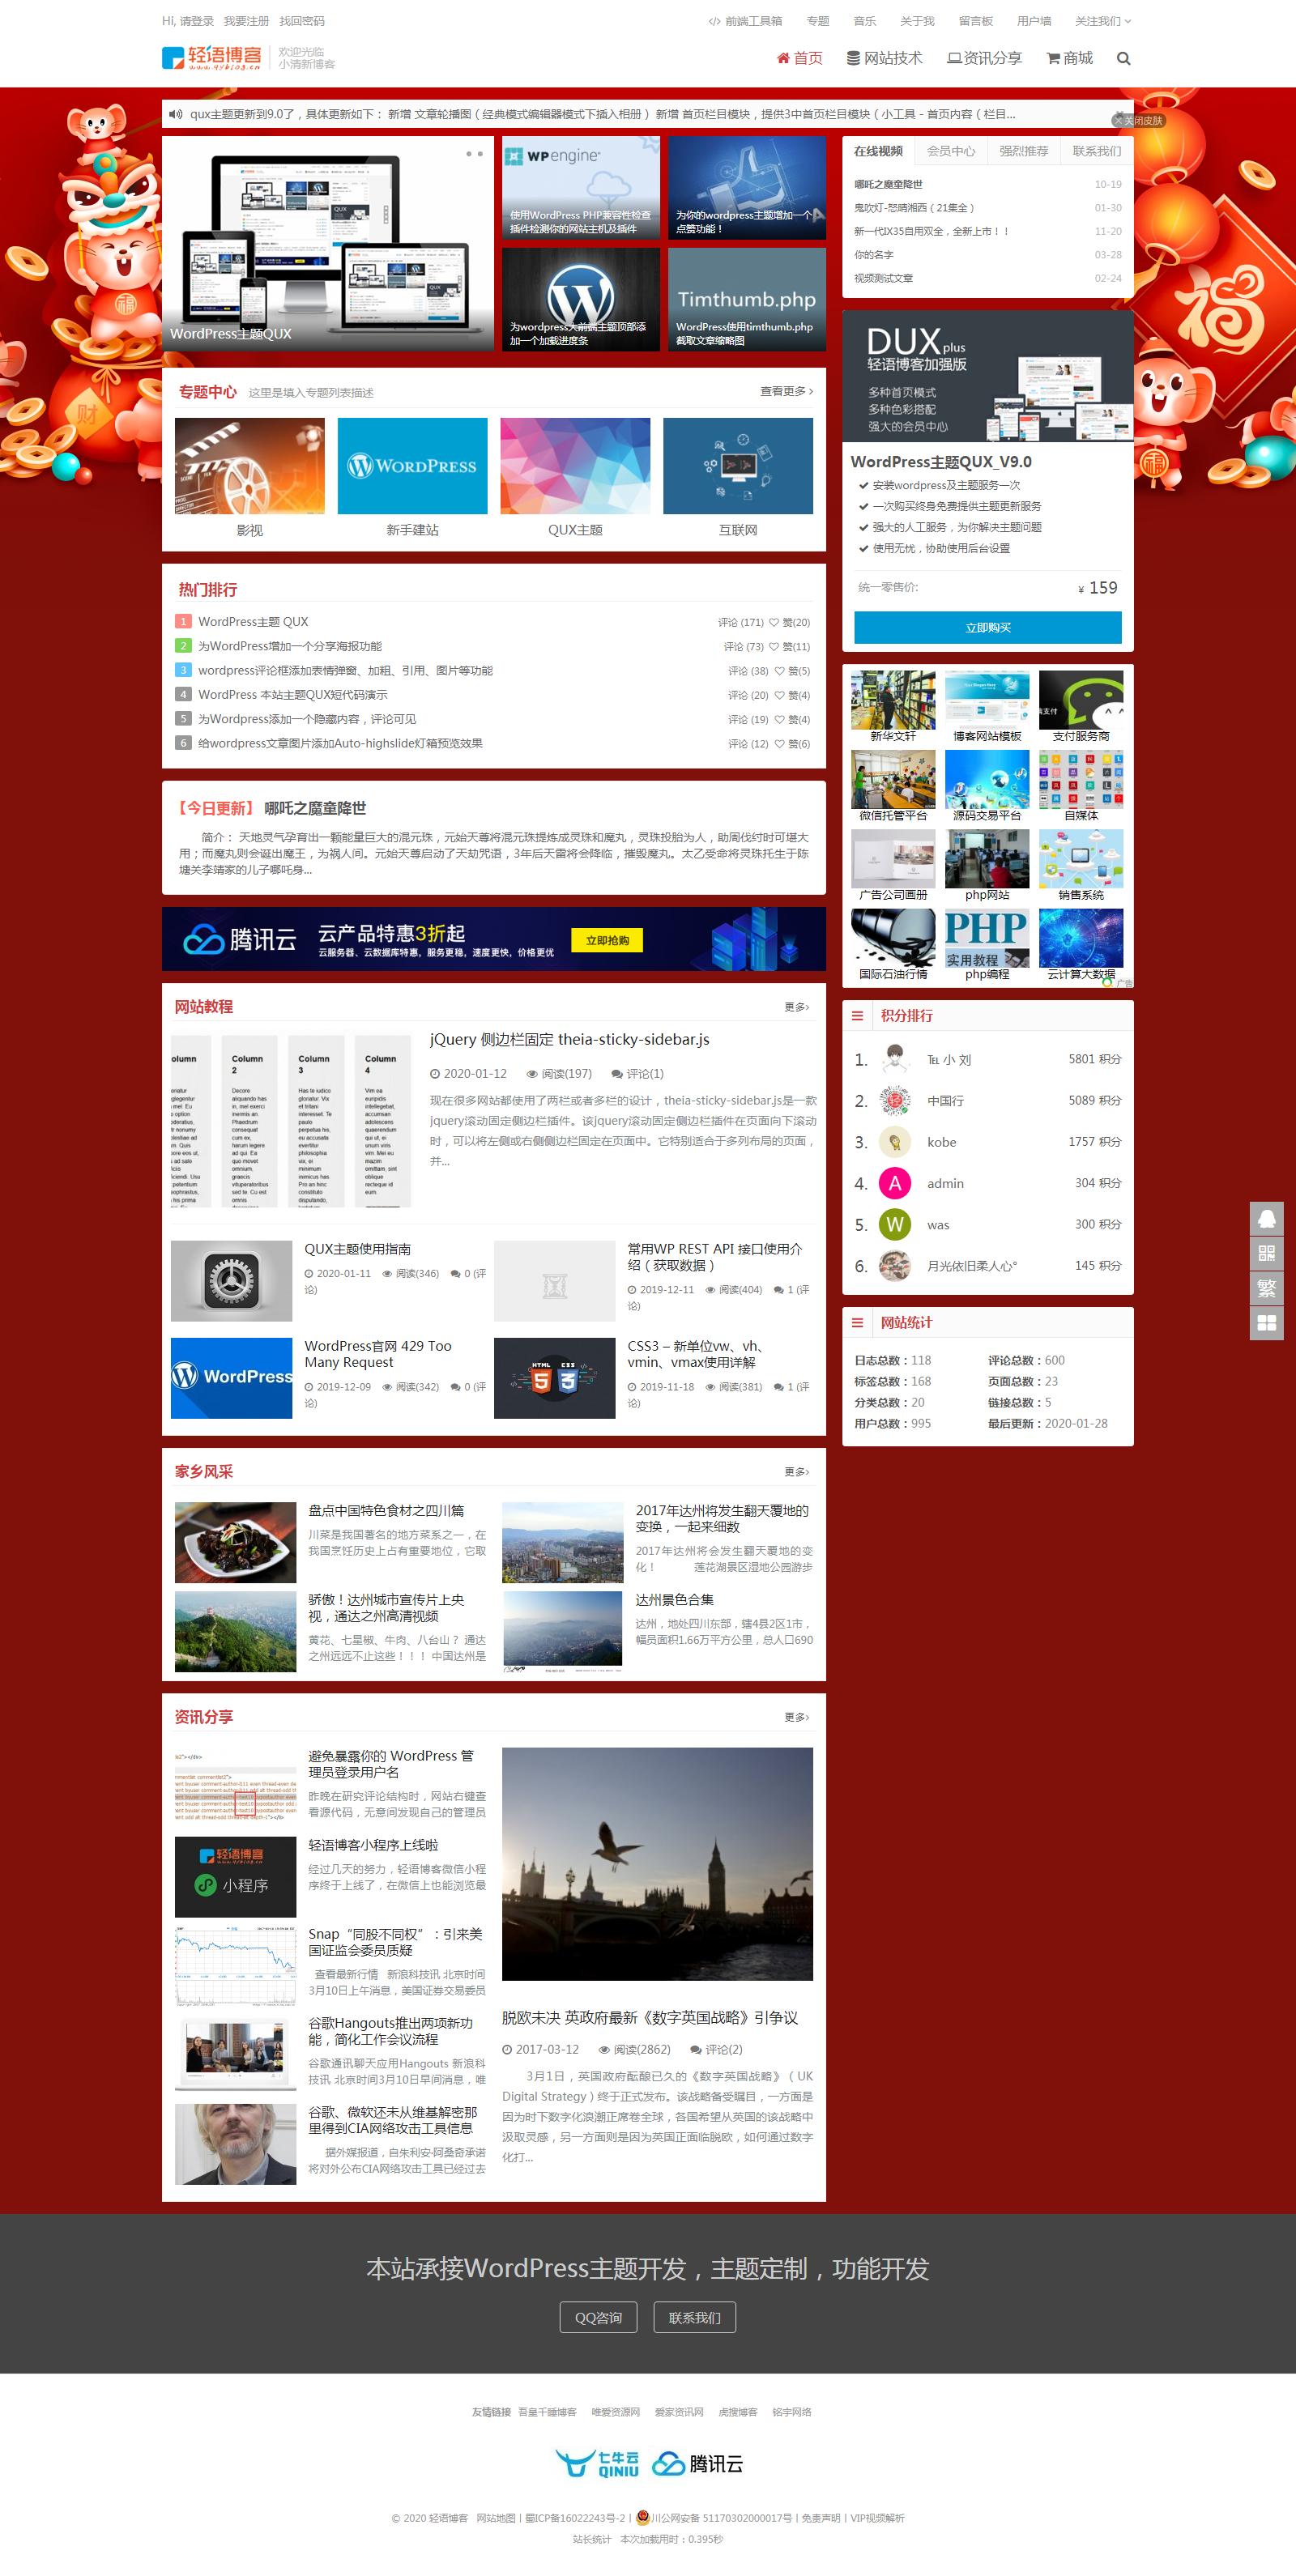 WordPress主题 QUX_plus_V9.1.4 完全免授权版